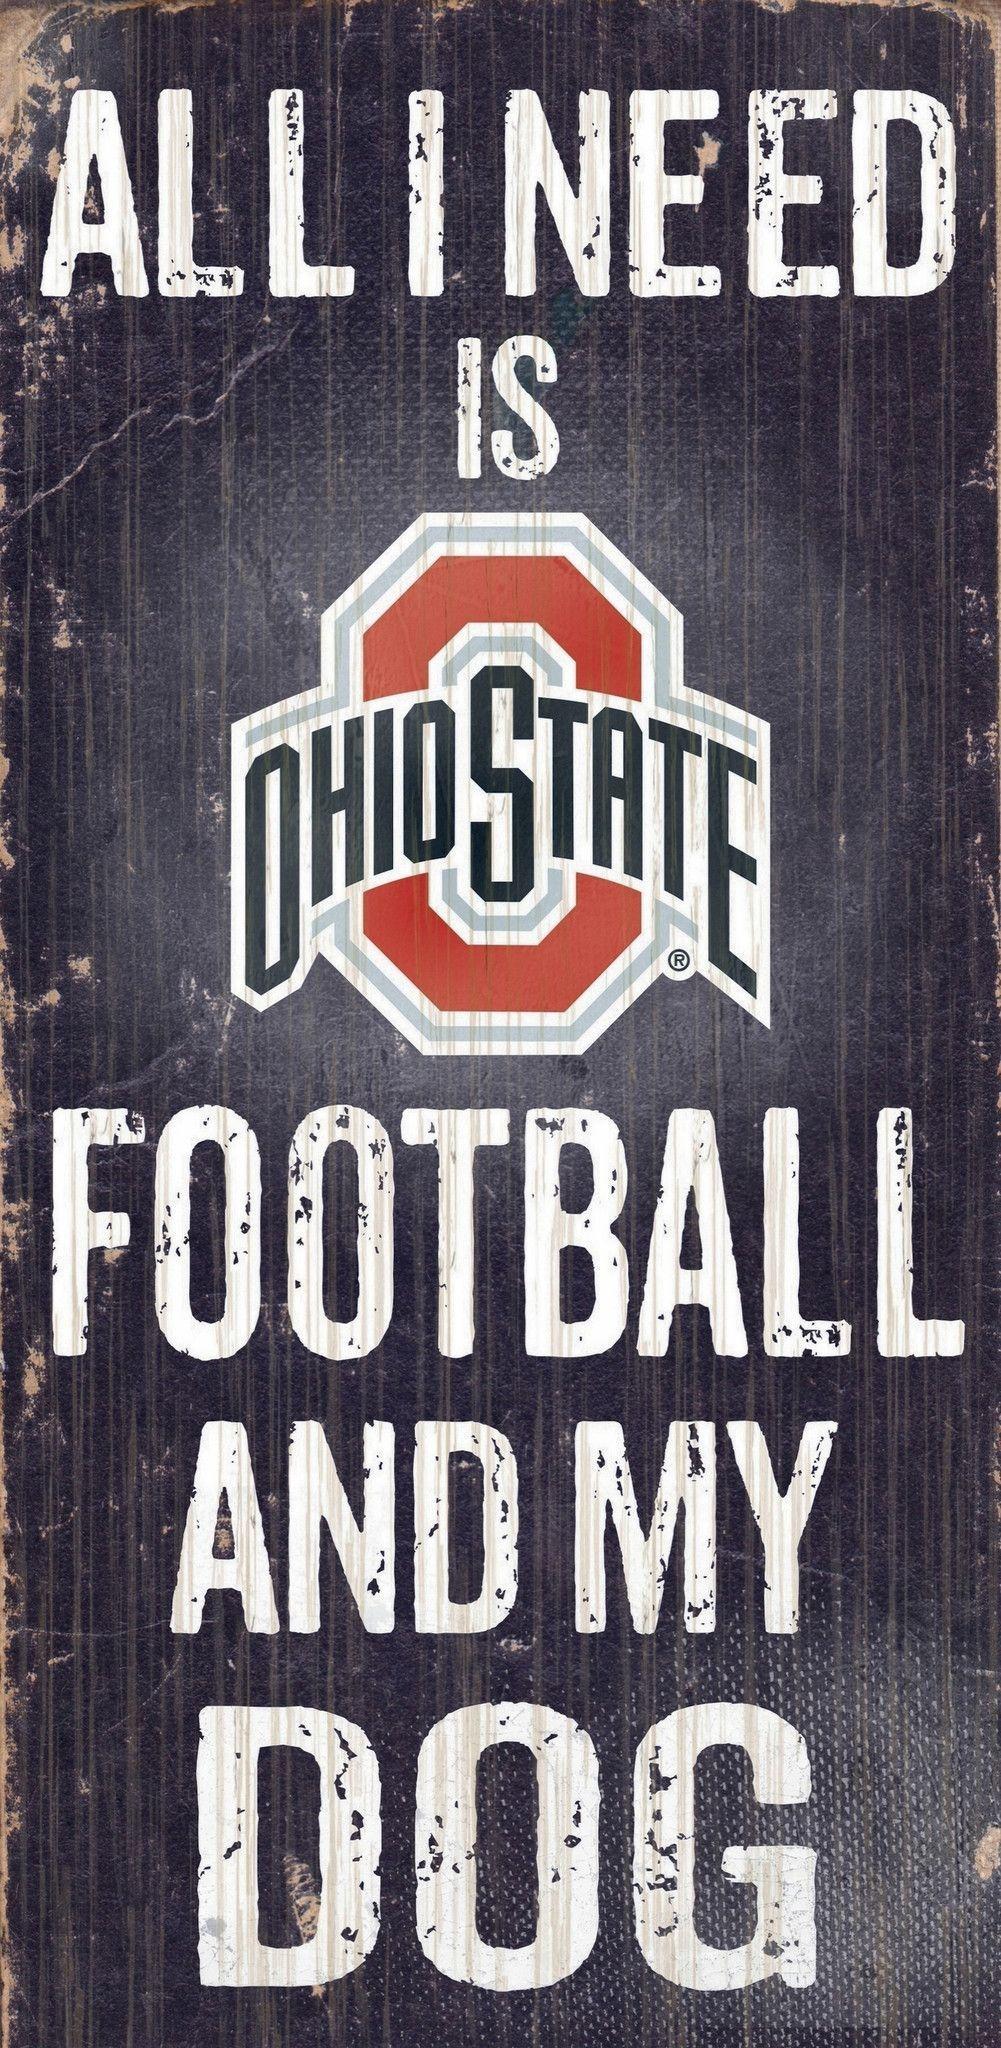 17b492b2999a5 Ohio State Buckeyes Wood Sign - Football and Dog 6